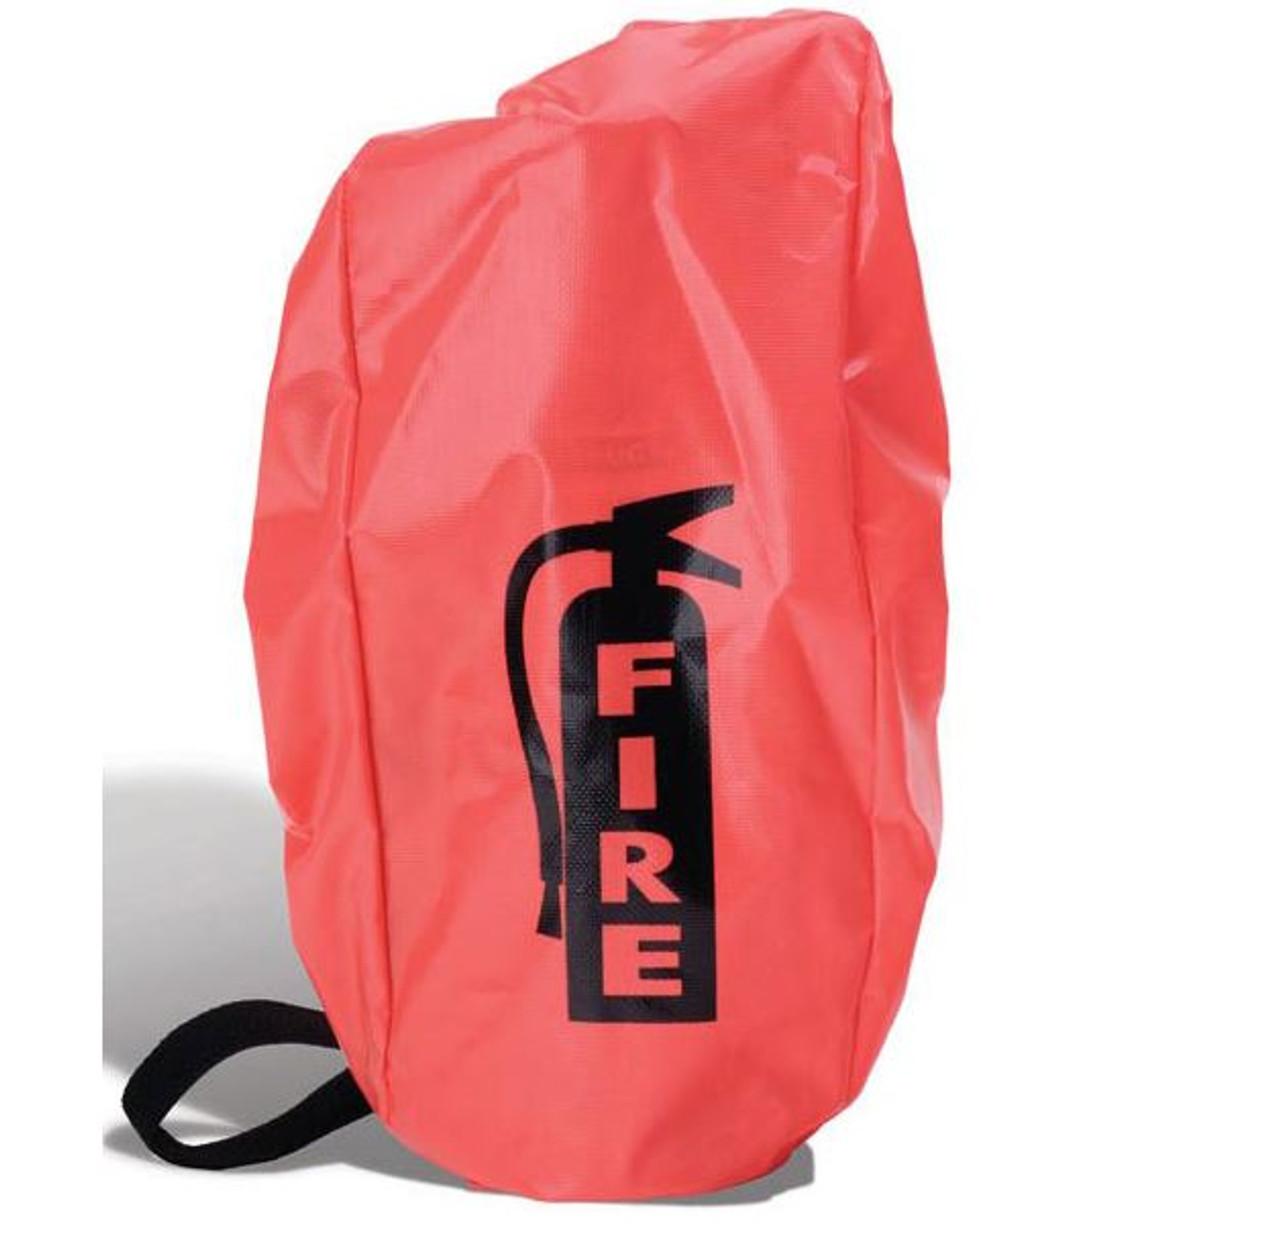 FEC5E - Small Fire Extinguisher Cover w/ Elastic,